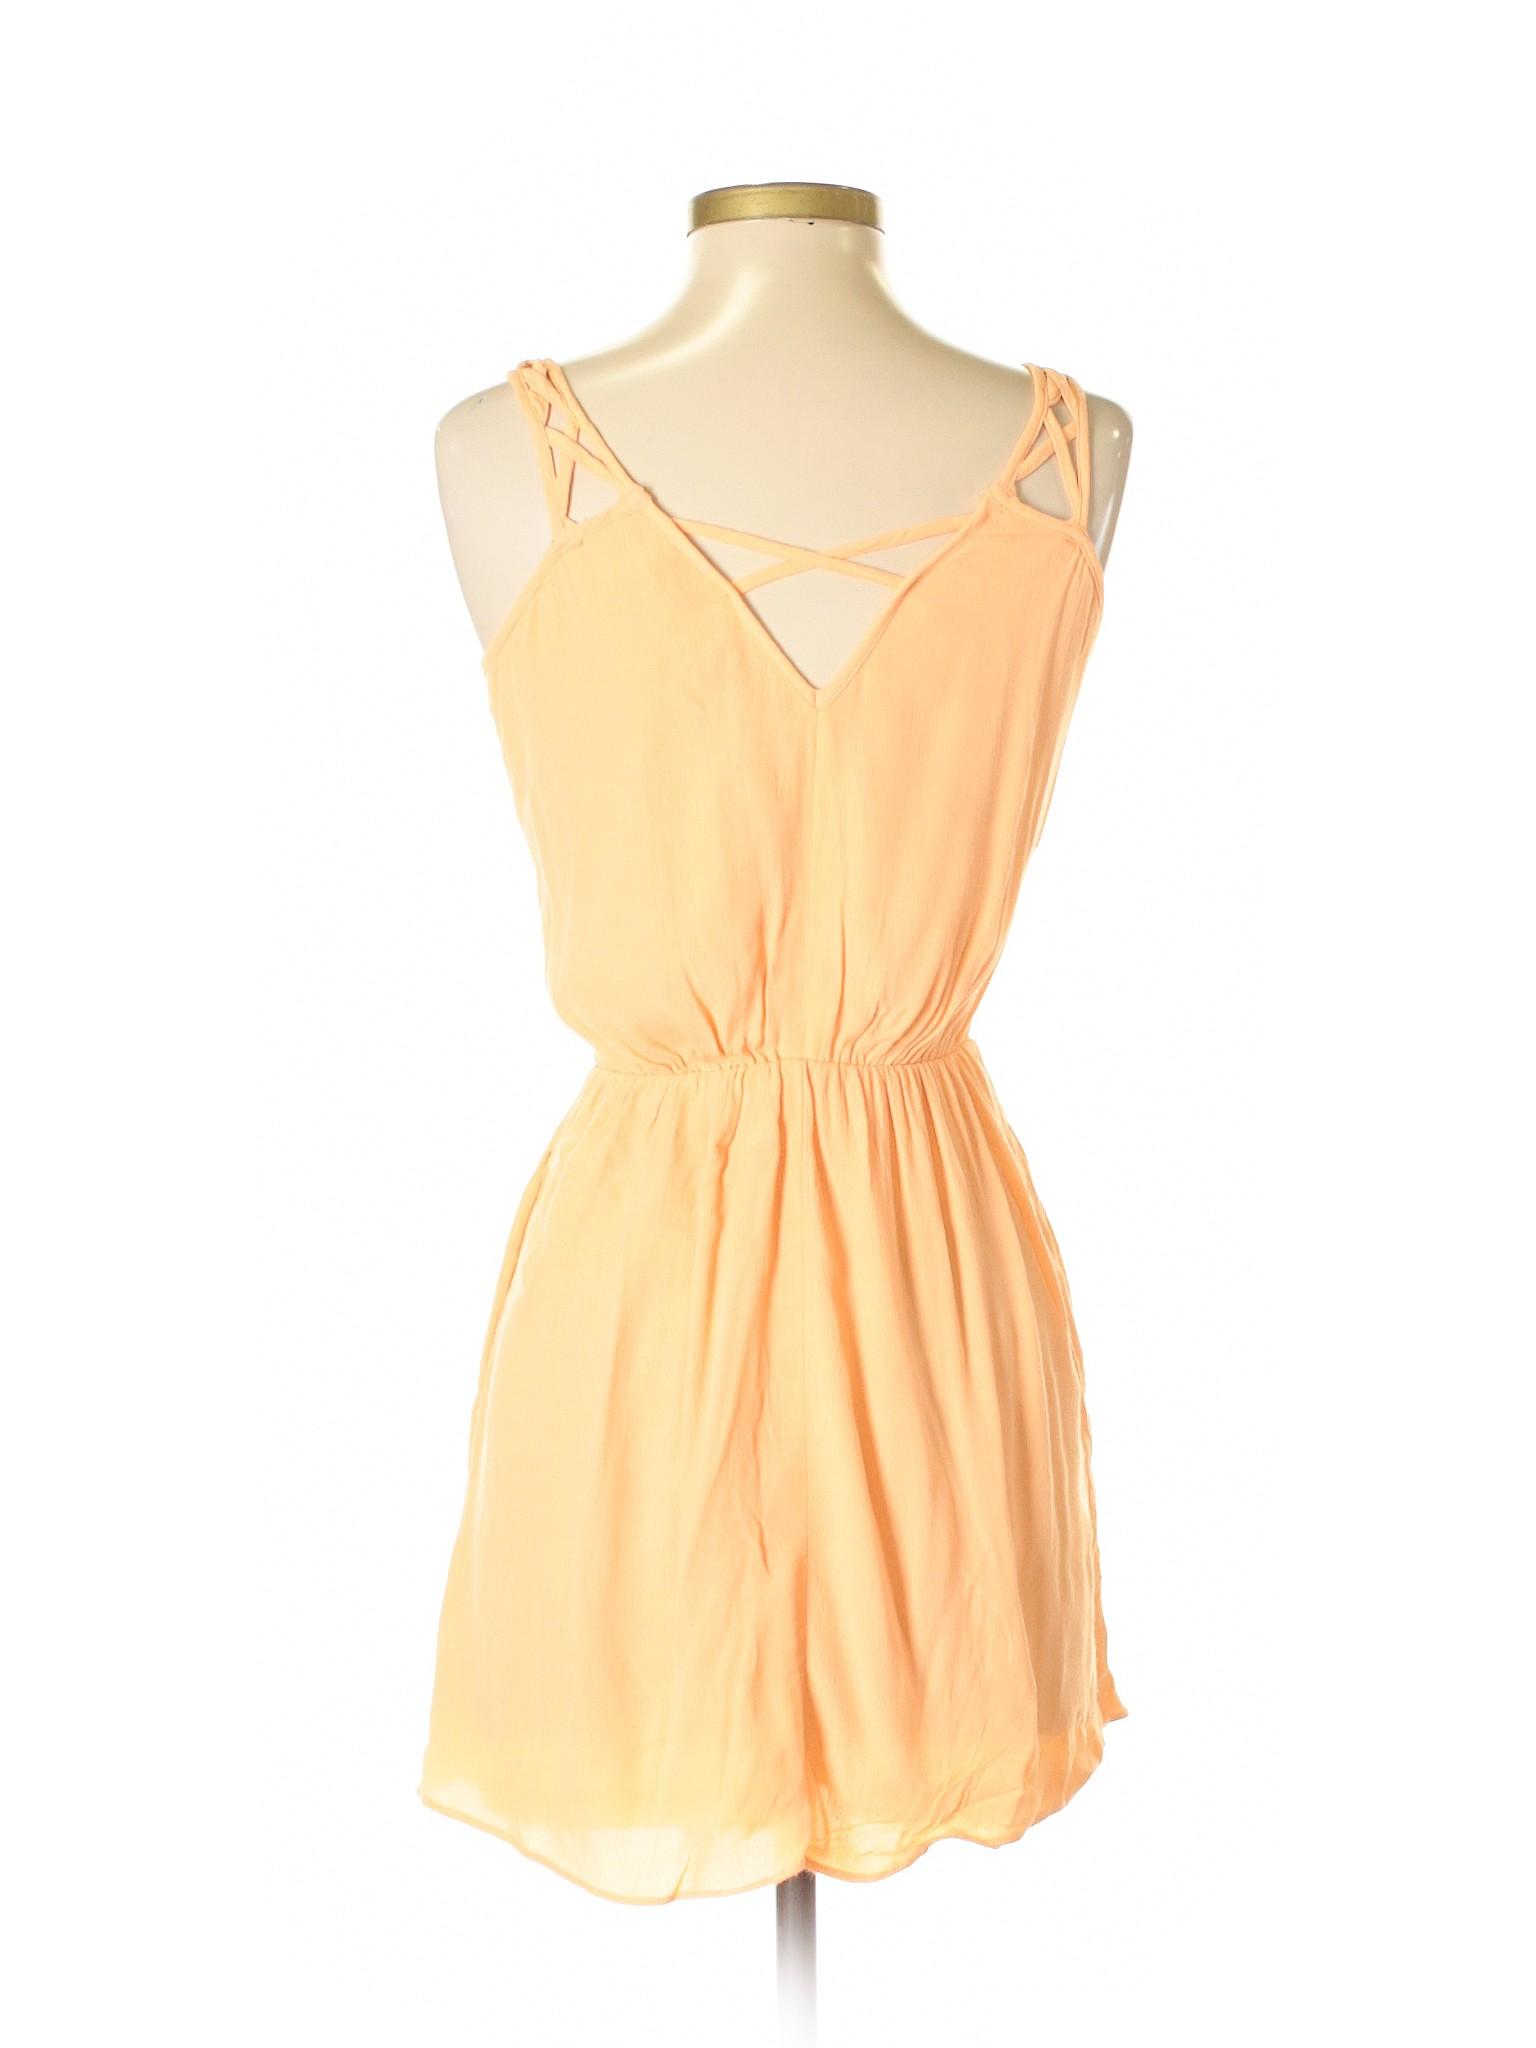 BCBGMAXAZRIA Boutique winter Casual winter Dress Boutique 1qp8wSFw